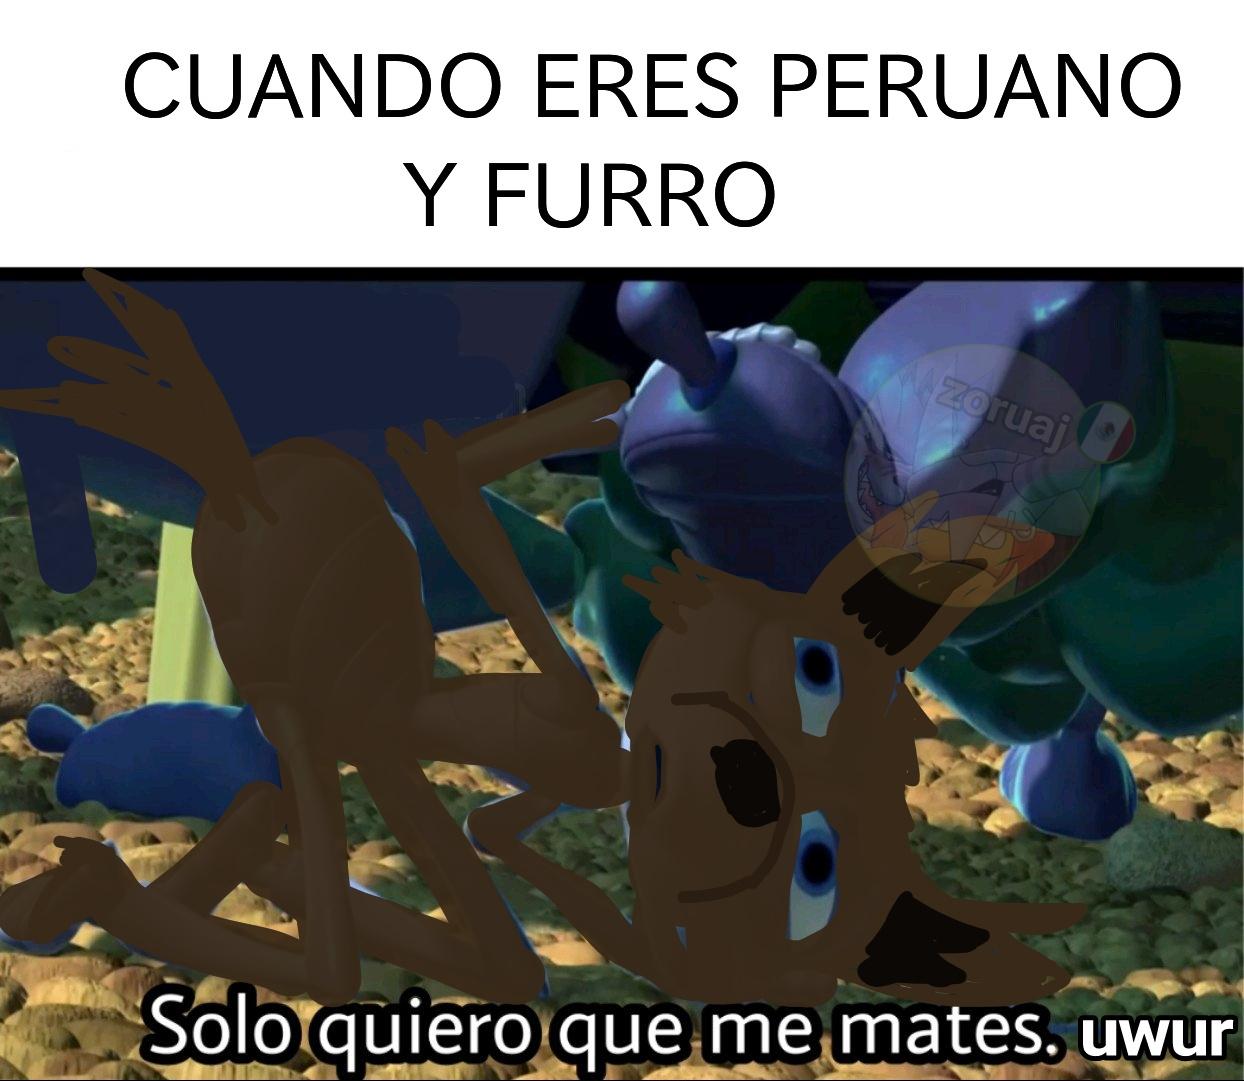 Dios no castiga dos veces... Peruano guero!!! - meme